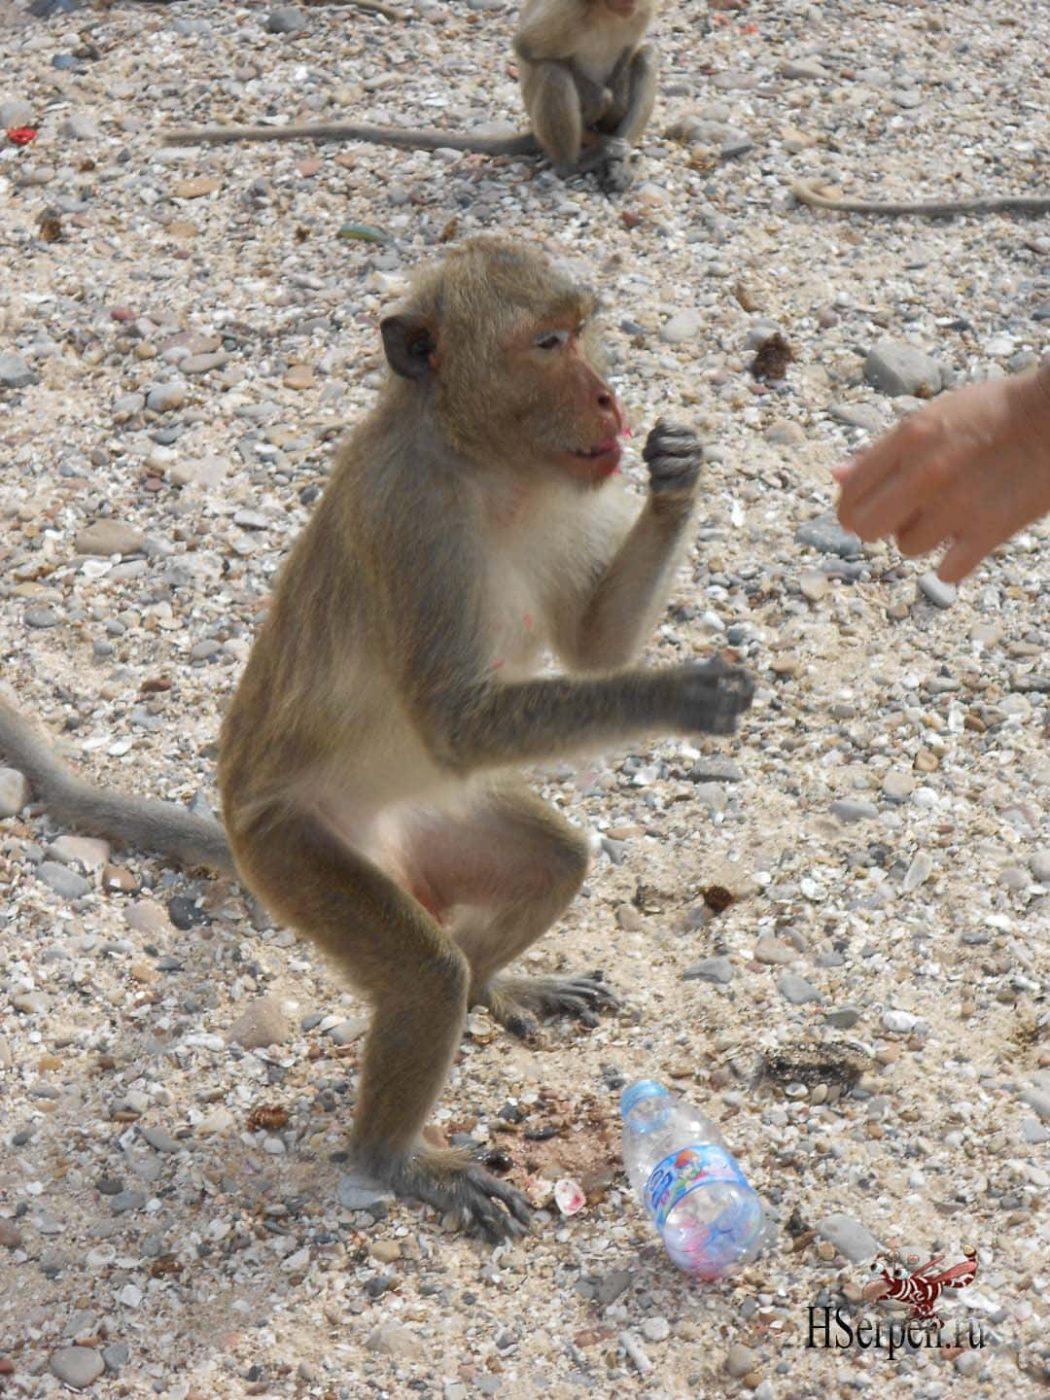 Истории острова обезьян, часть 1